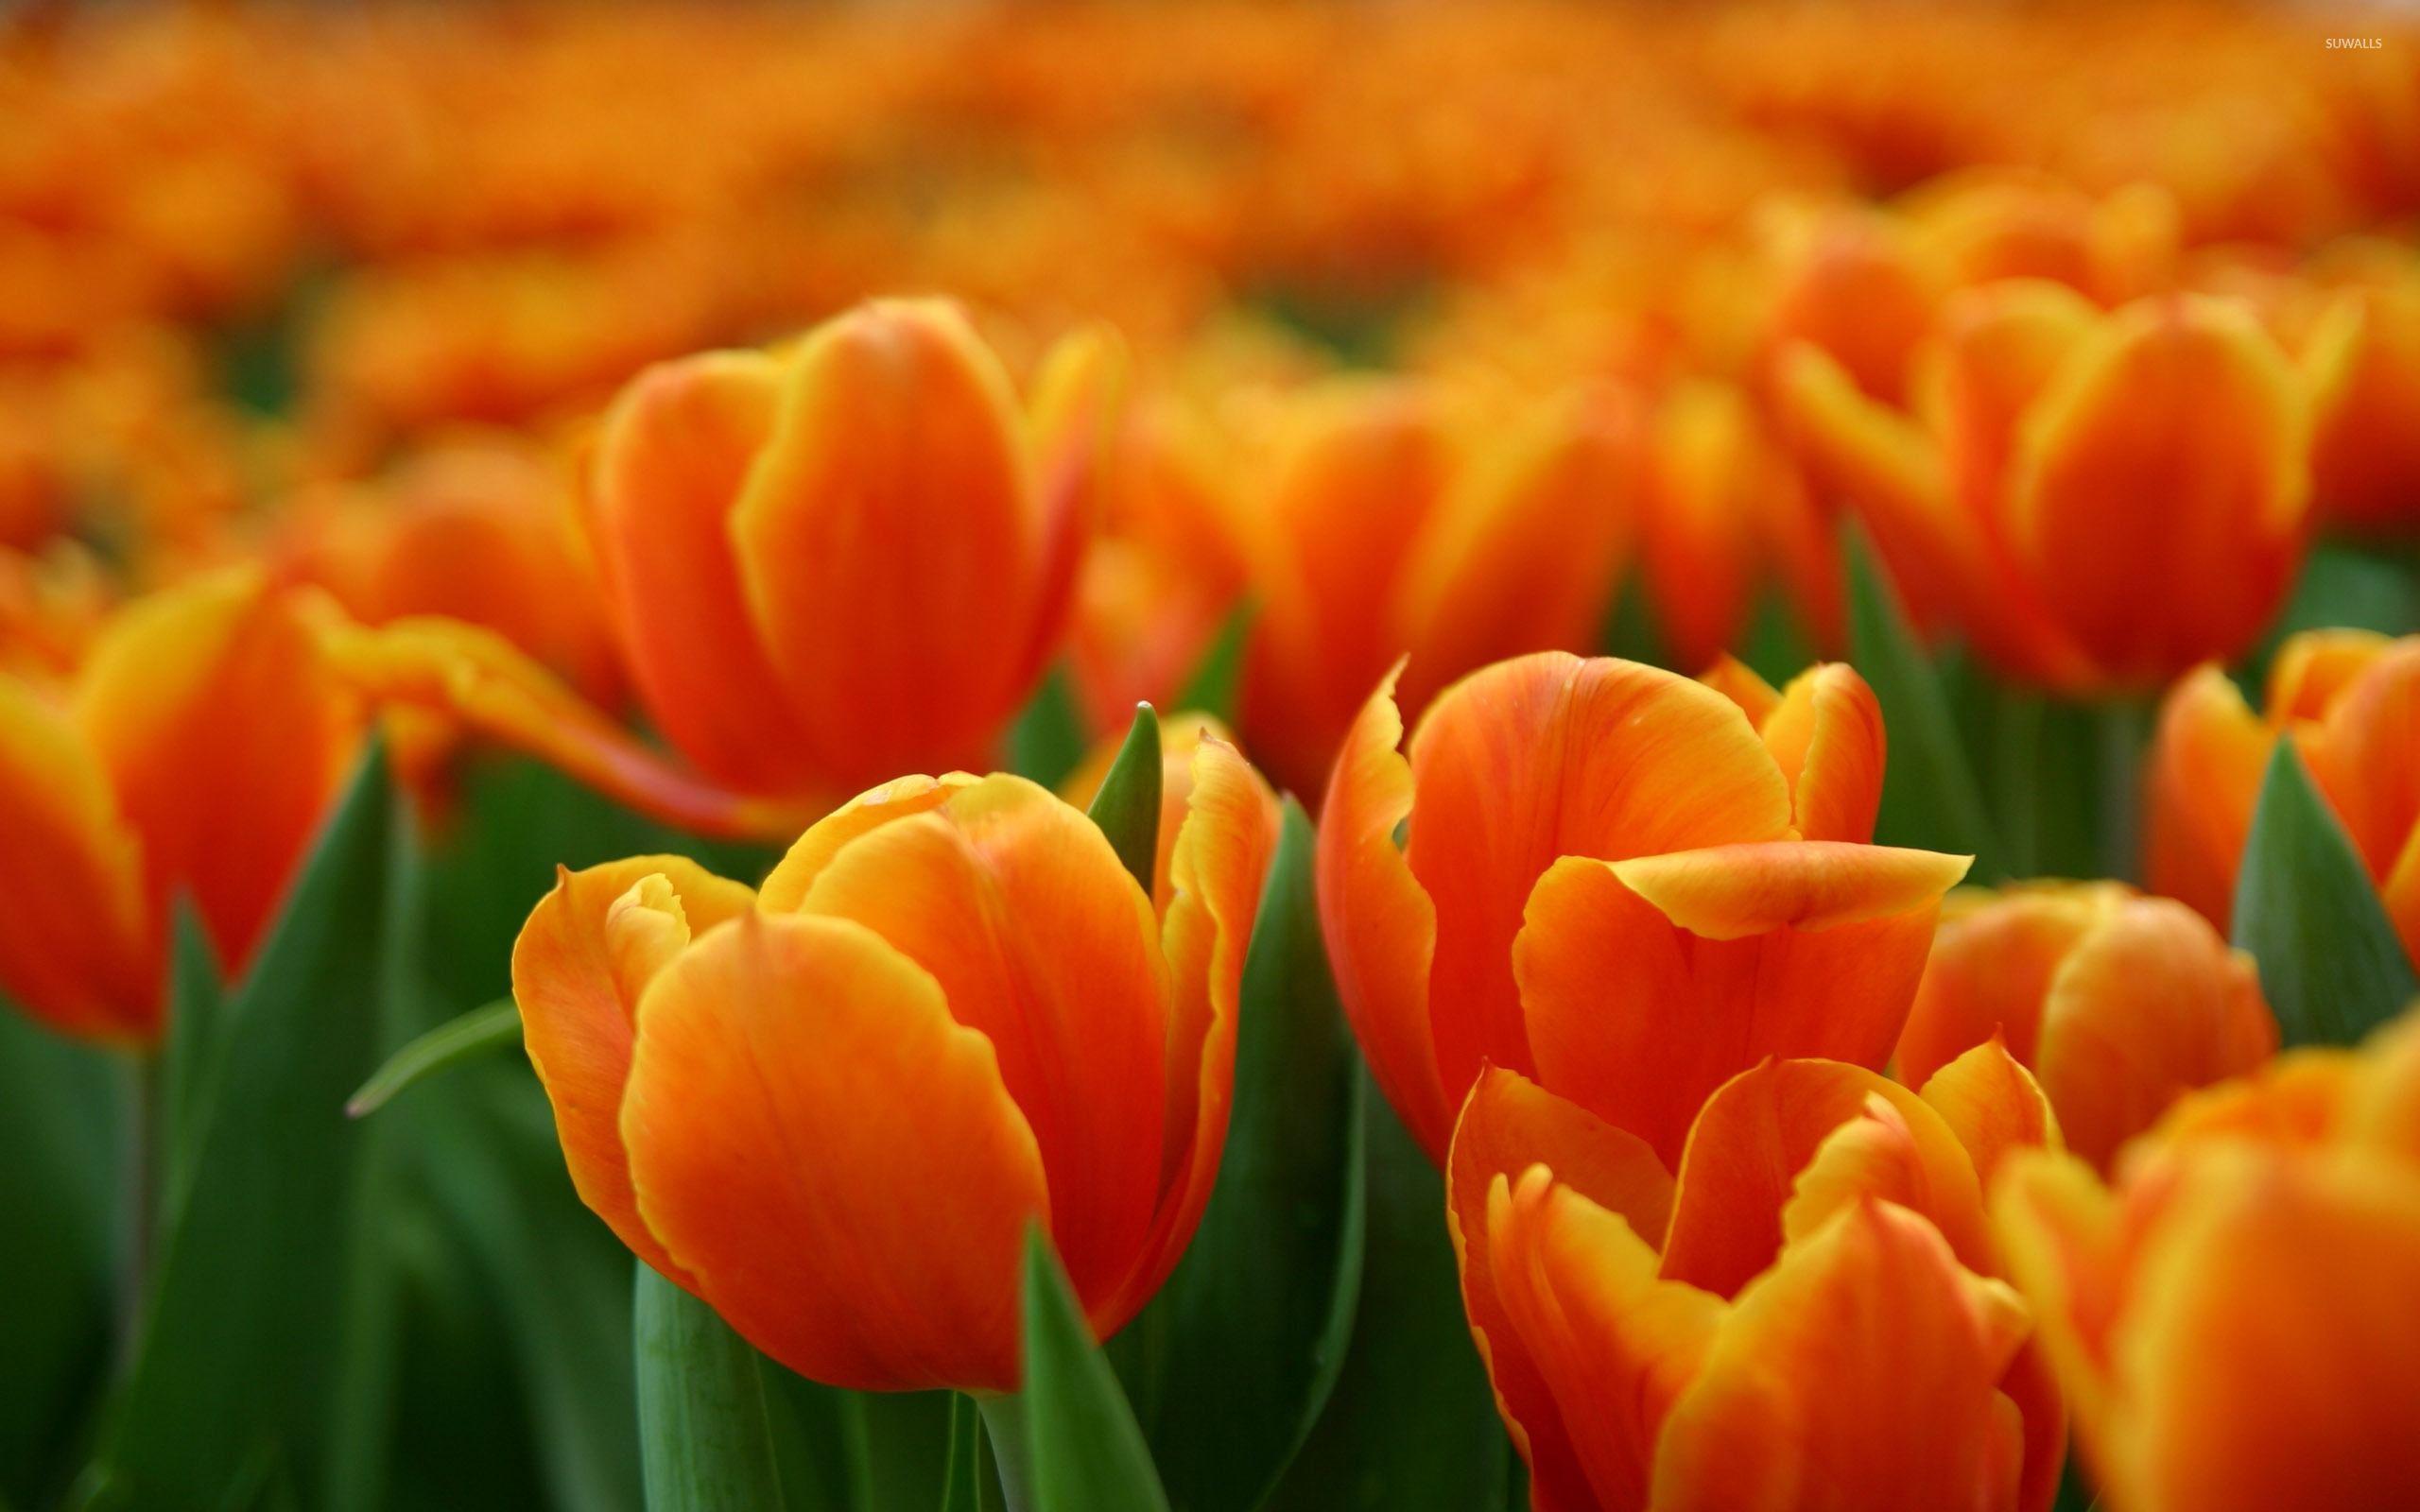 Orange Tulips [2] Wallpaper - Orange Tulips , HD Wallpaper & Backgrounds